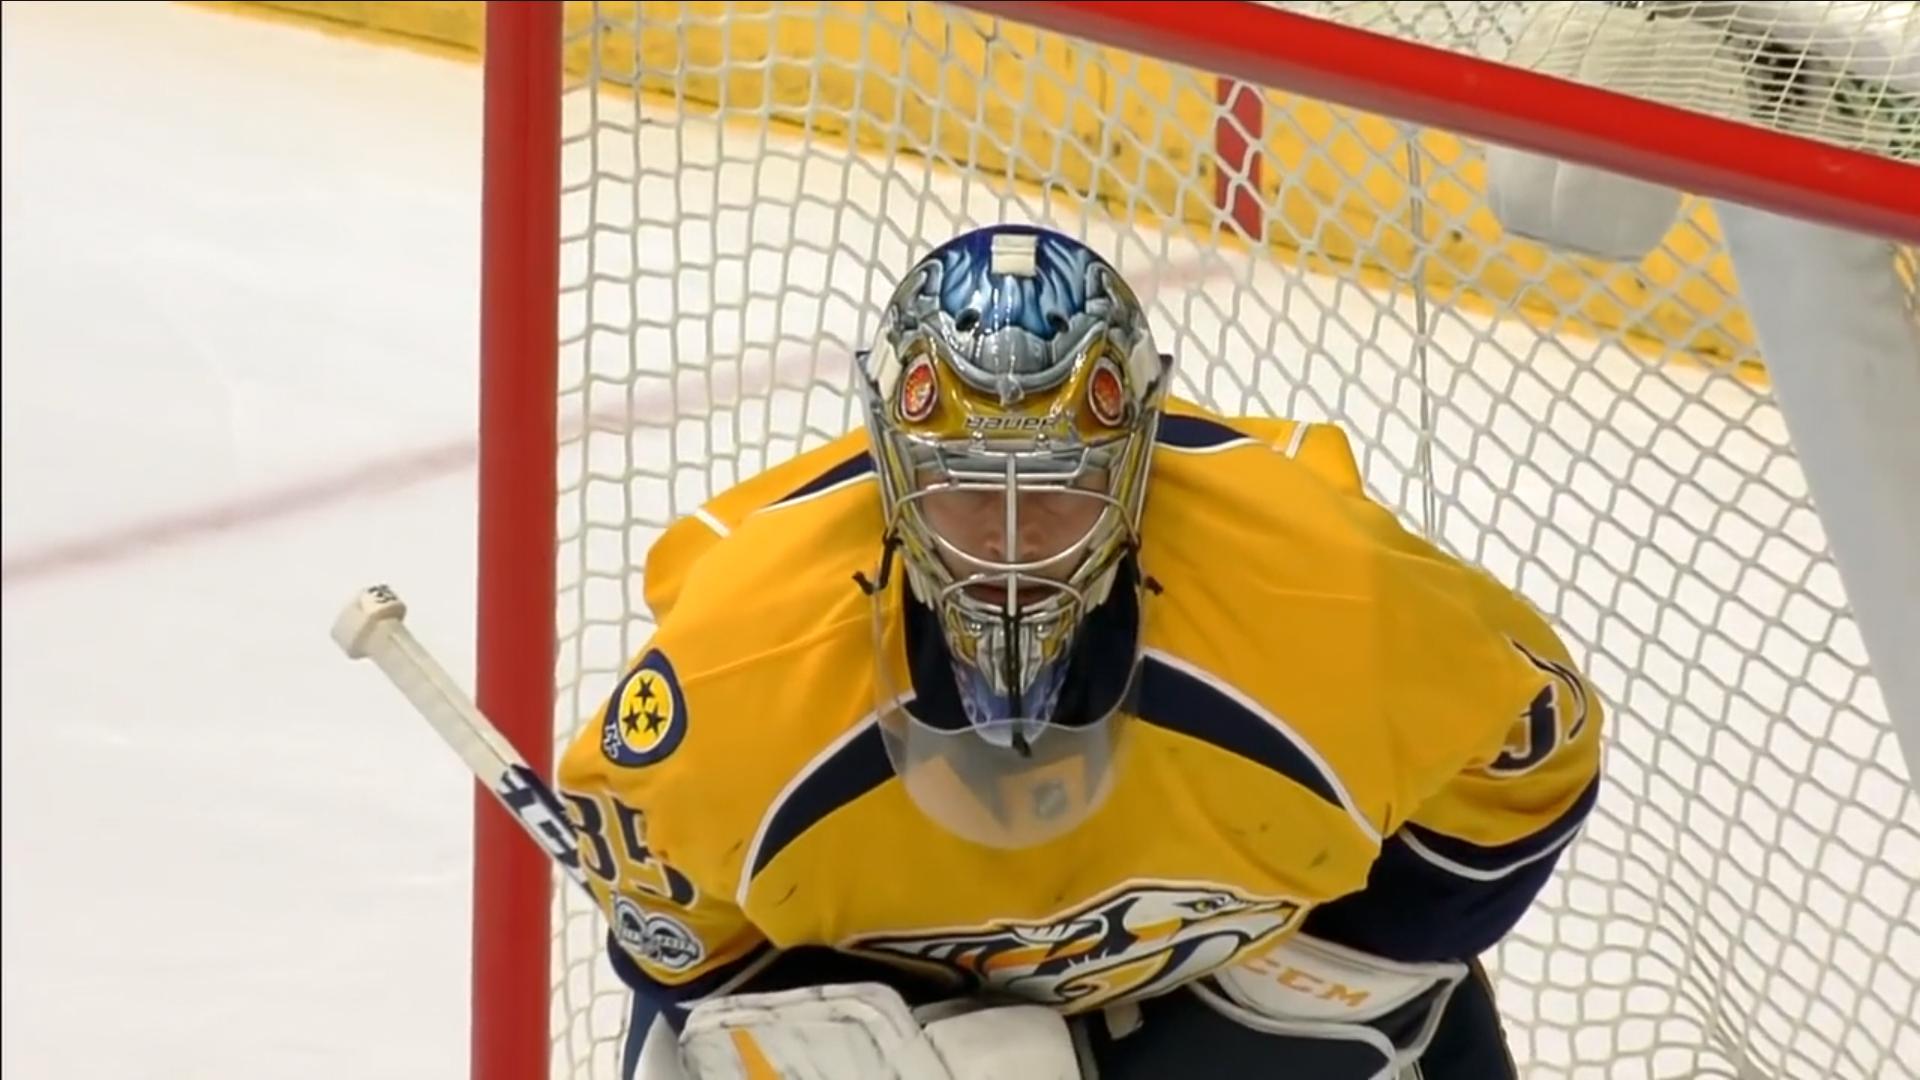 Nashville Predators take 2-1 series lead blues game 3